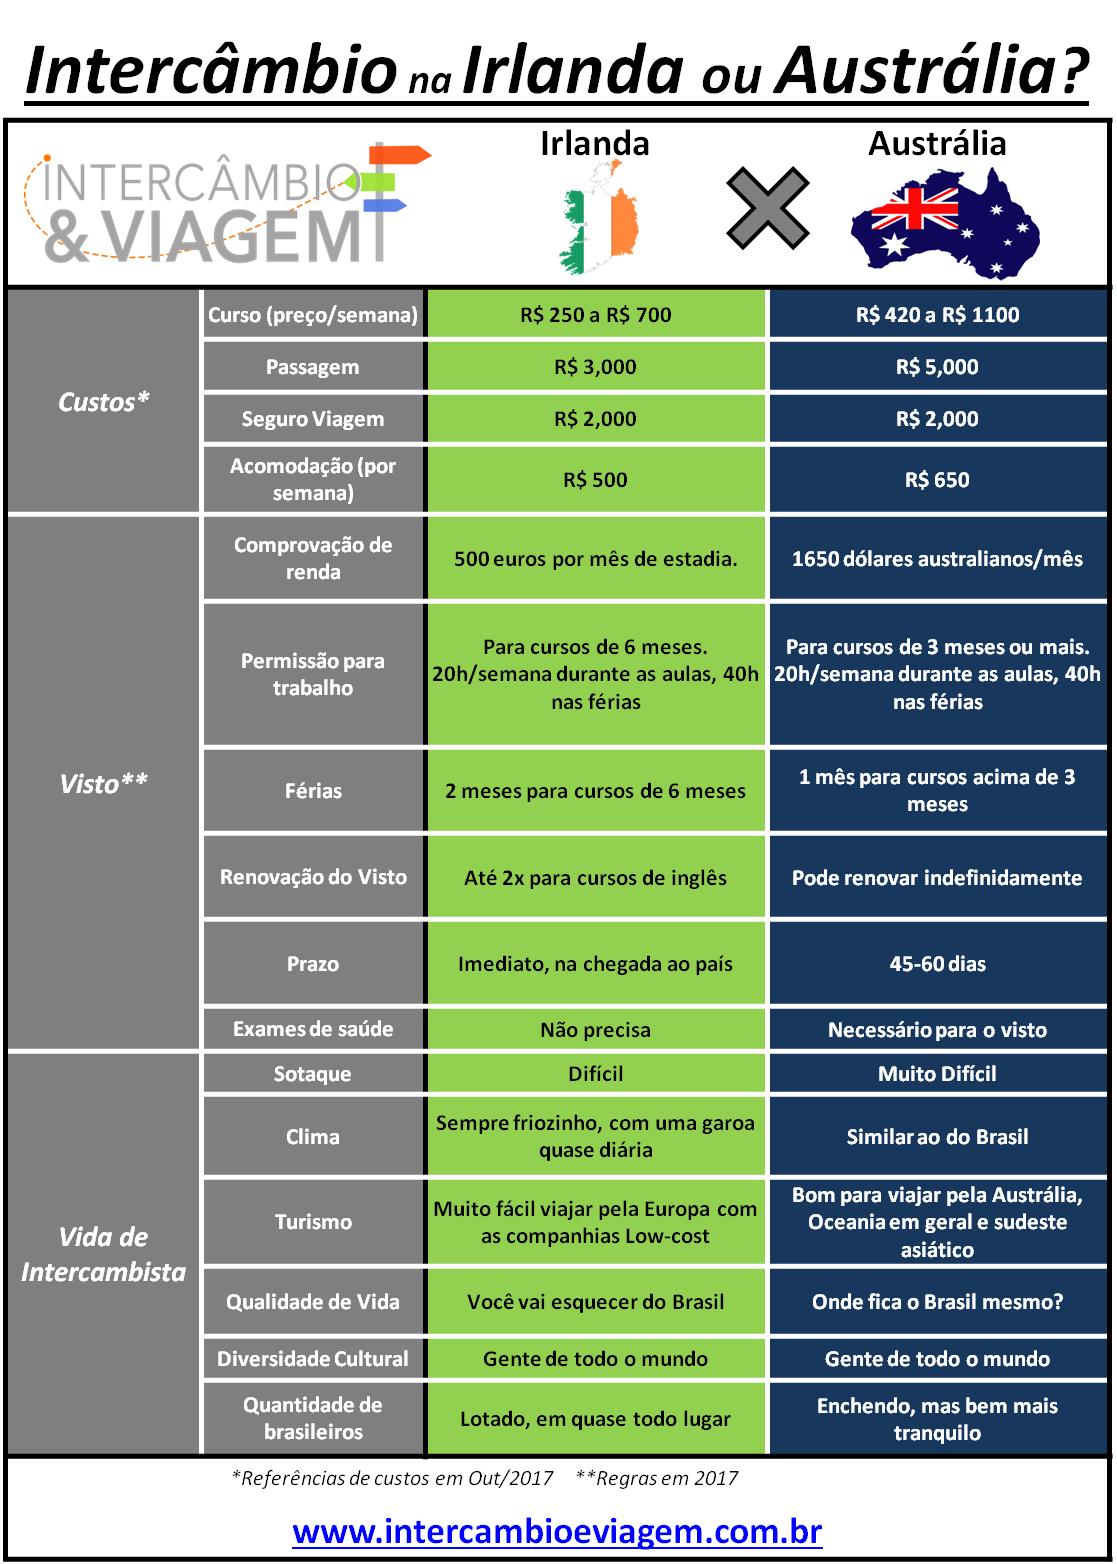 Intercâmbio na Irlanda ou Austrália - Tabela comparativa